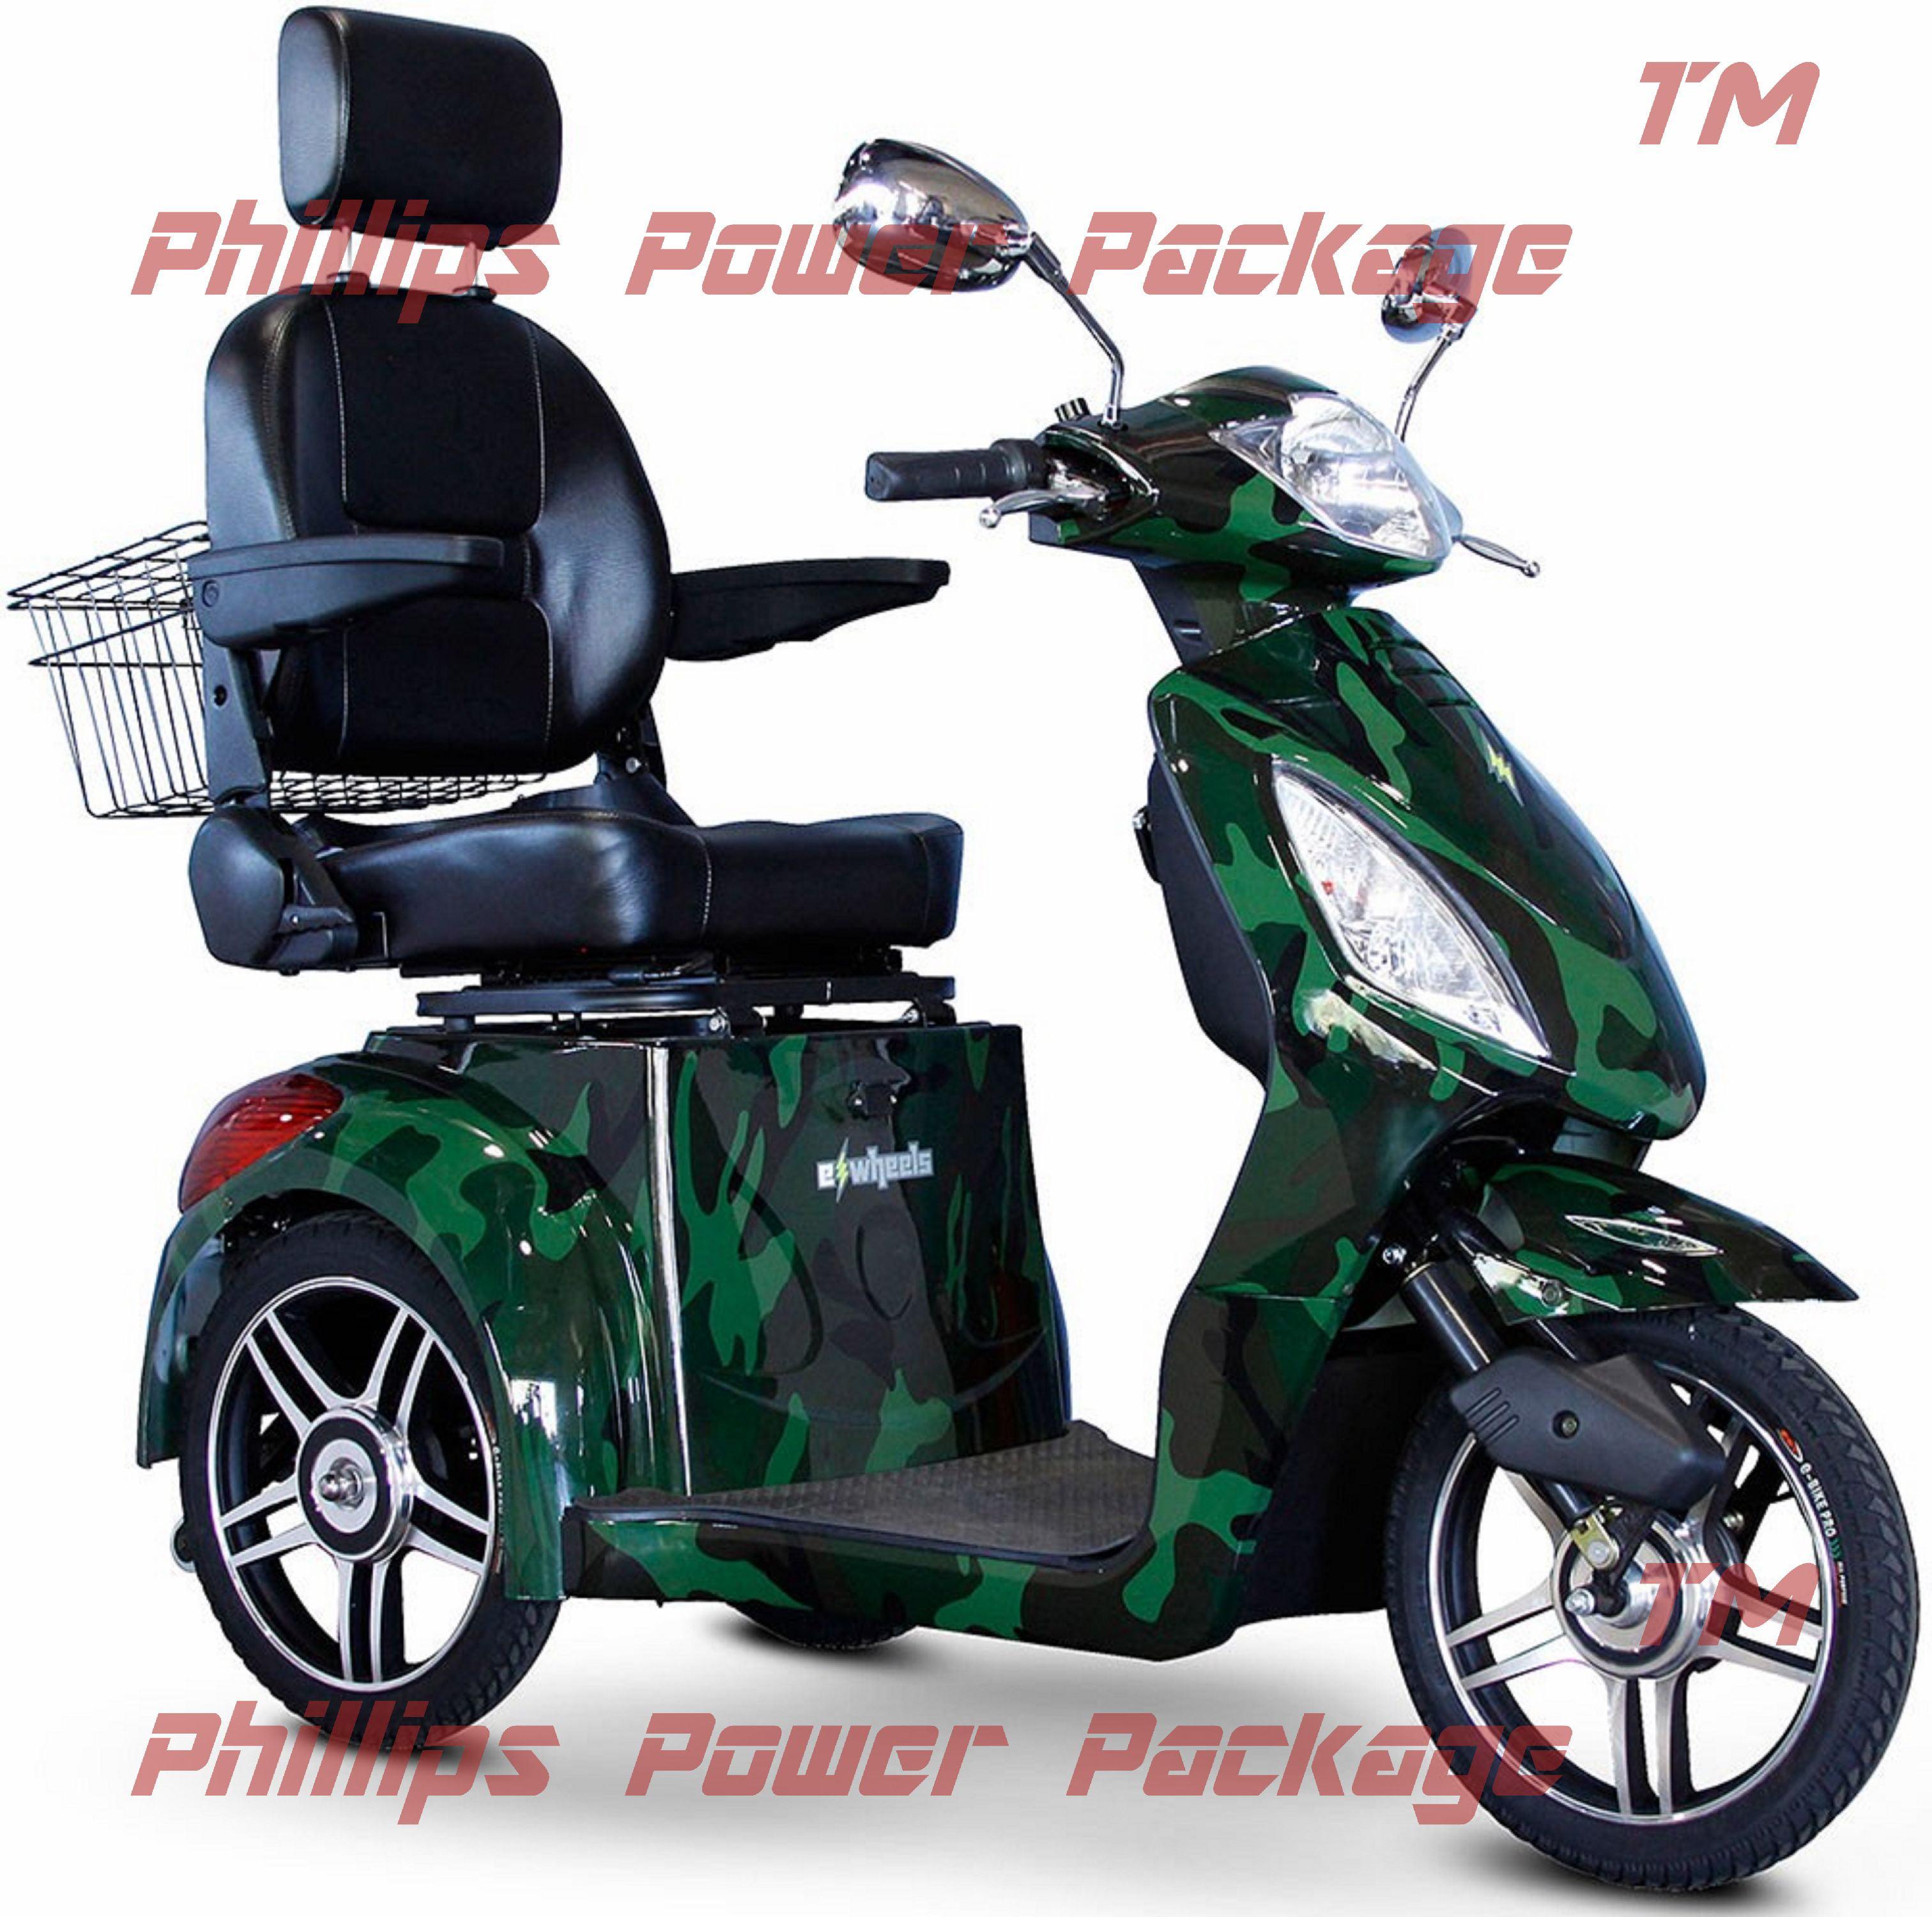 E-Wheels - EW-36 Elite Scooter with Electromagnetic Brakes - 3-Wheel - Camouflage